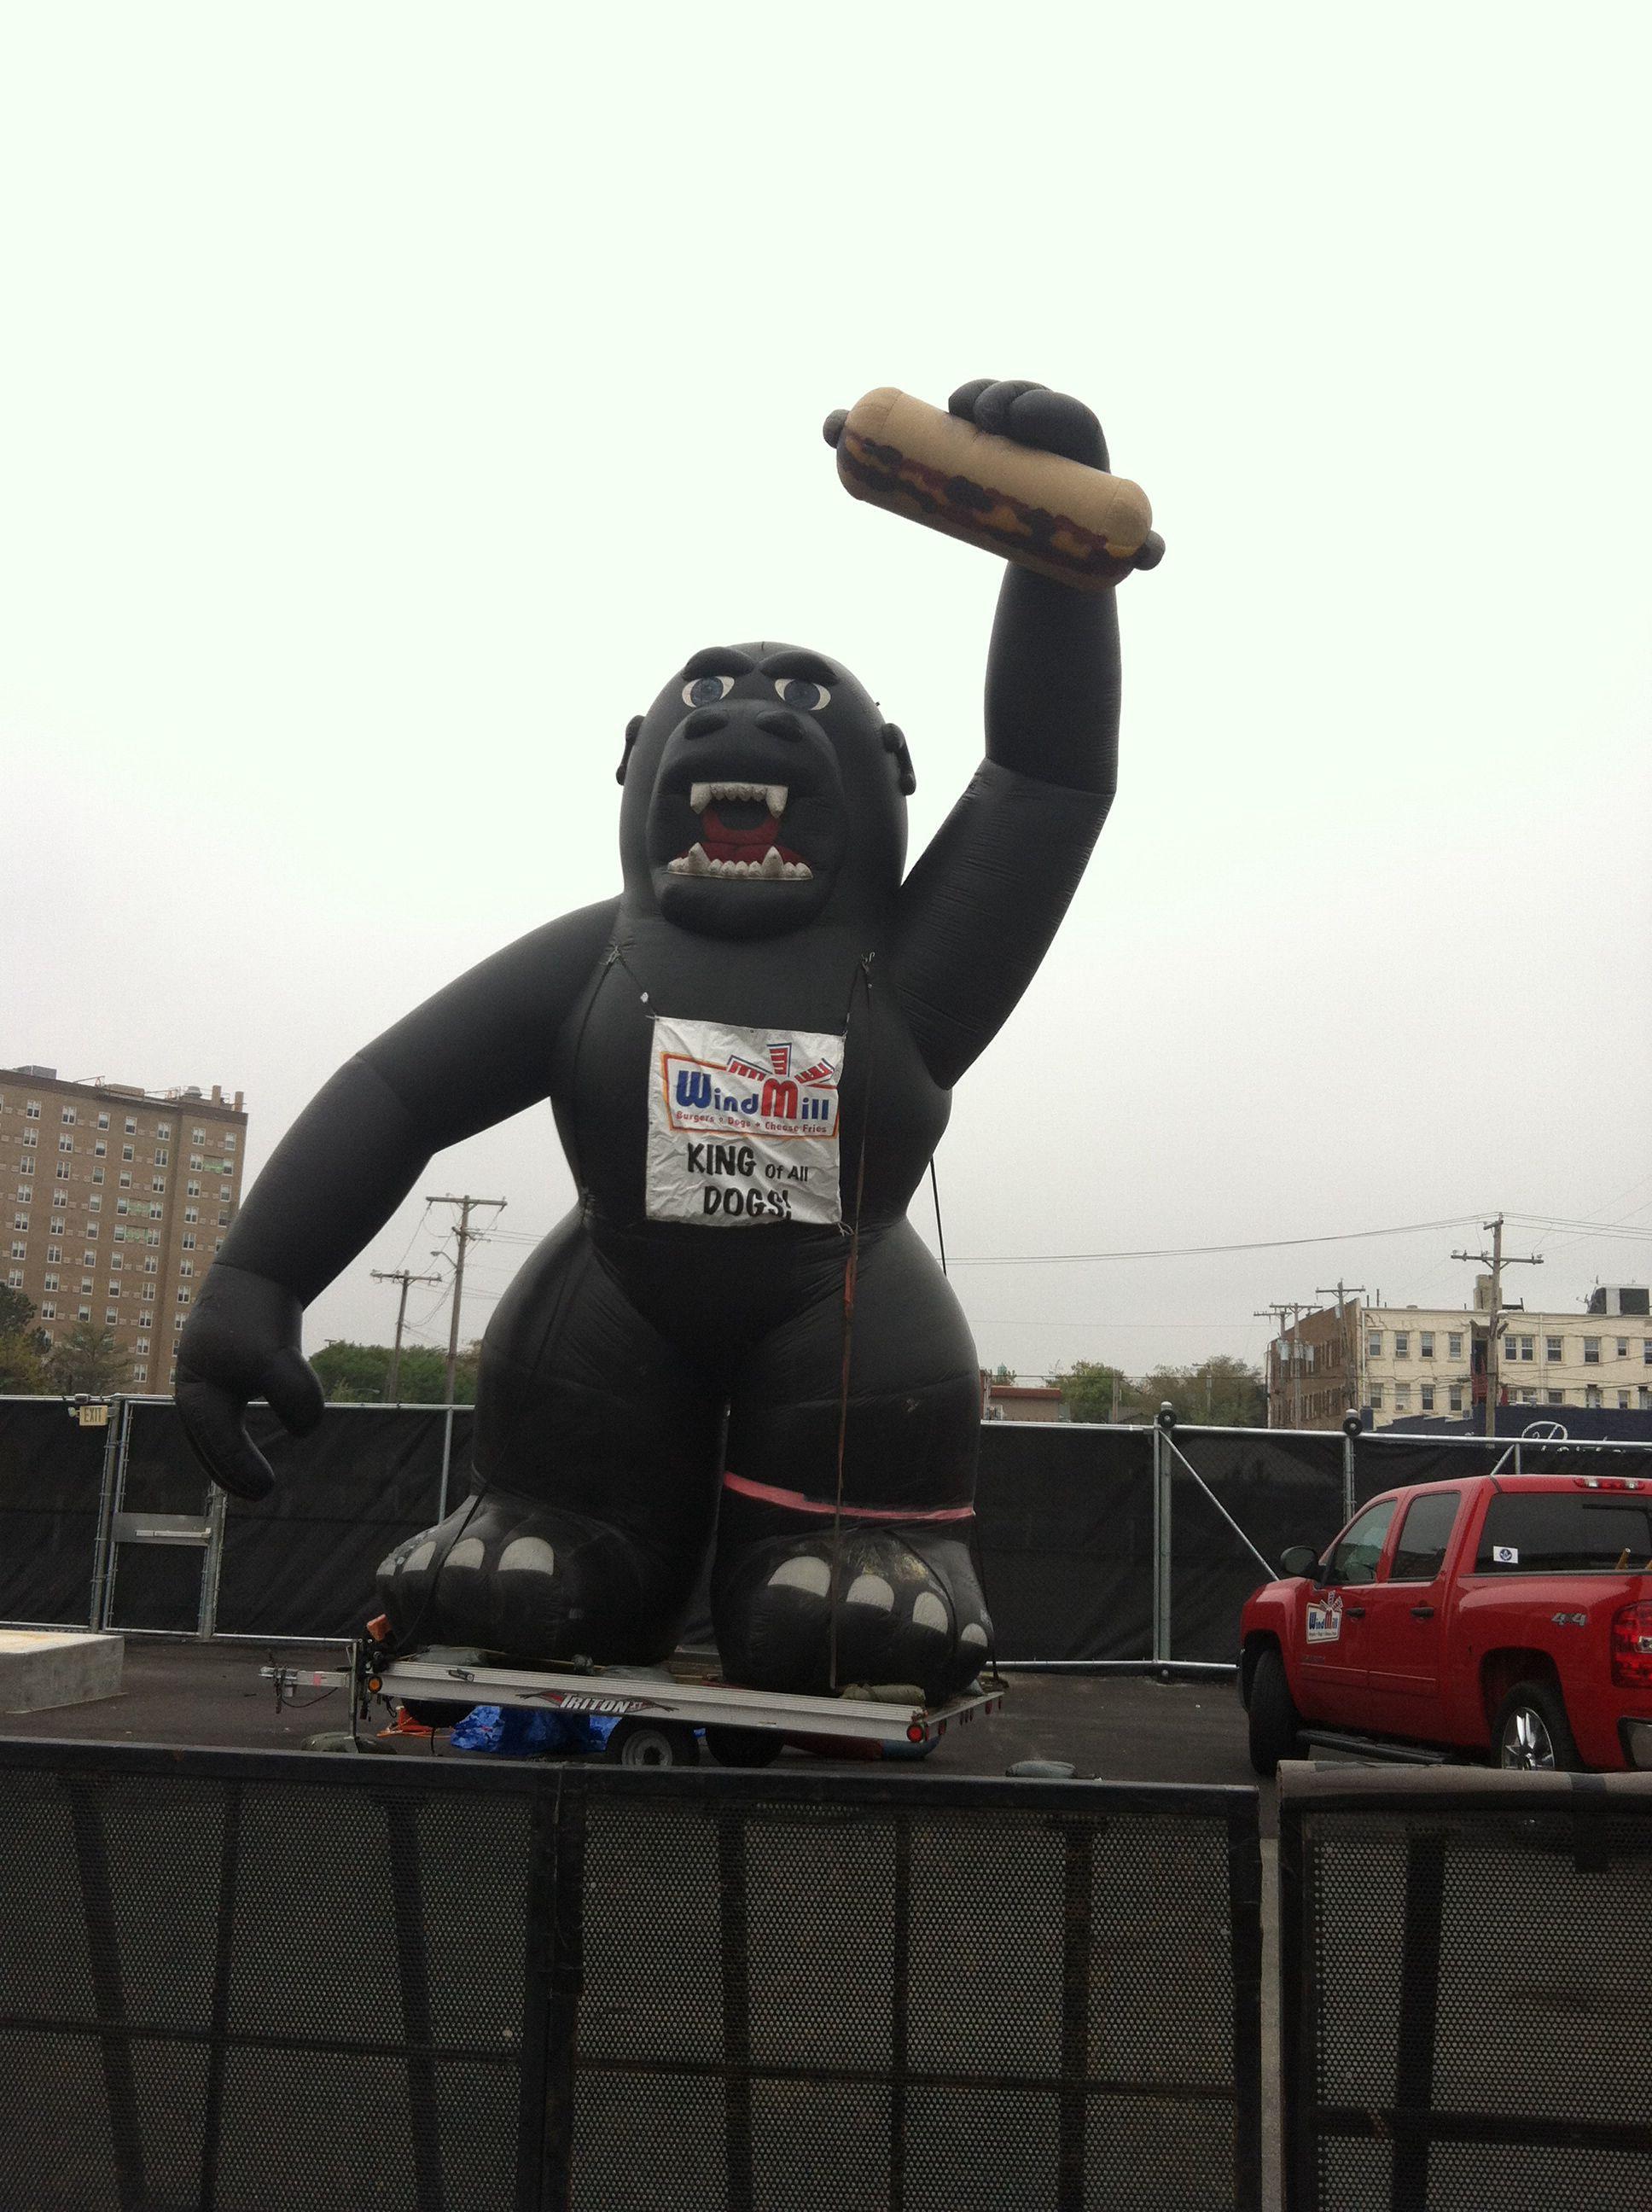 Gorilla advertising the windmill in asbury park